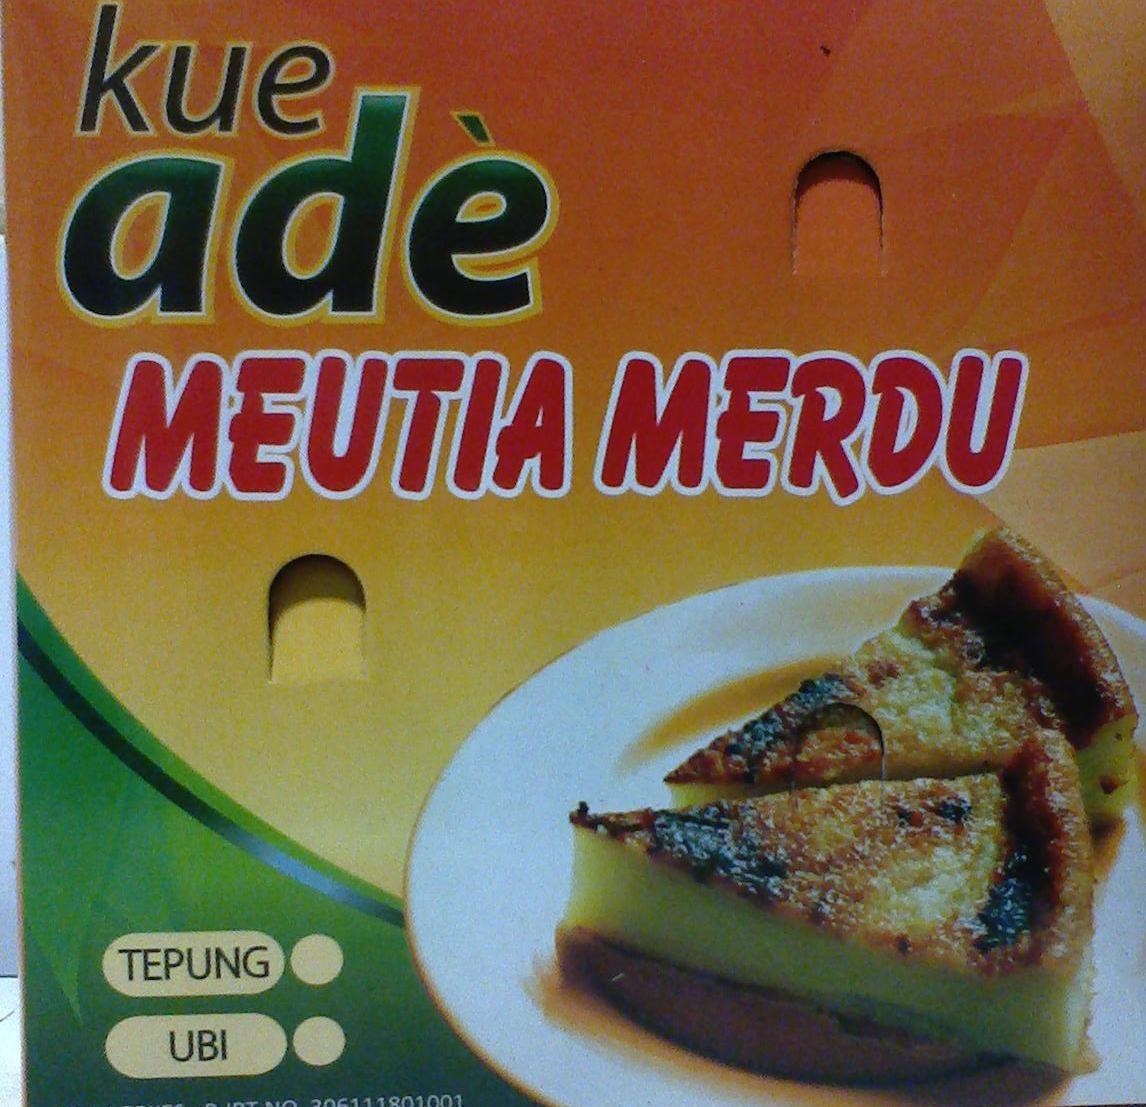 Kue Kak Ade Rambah Pasar Internasional Aceh Selatan News Food Breakfast Toast